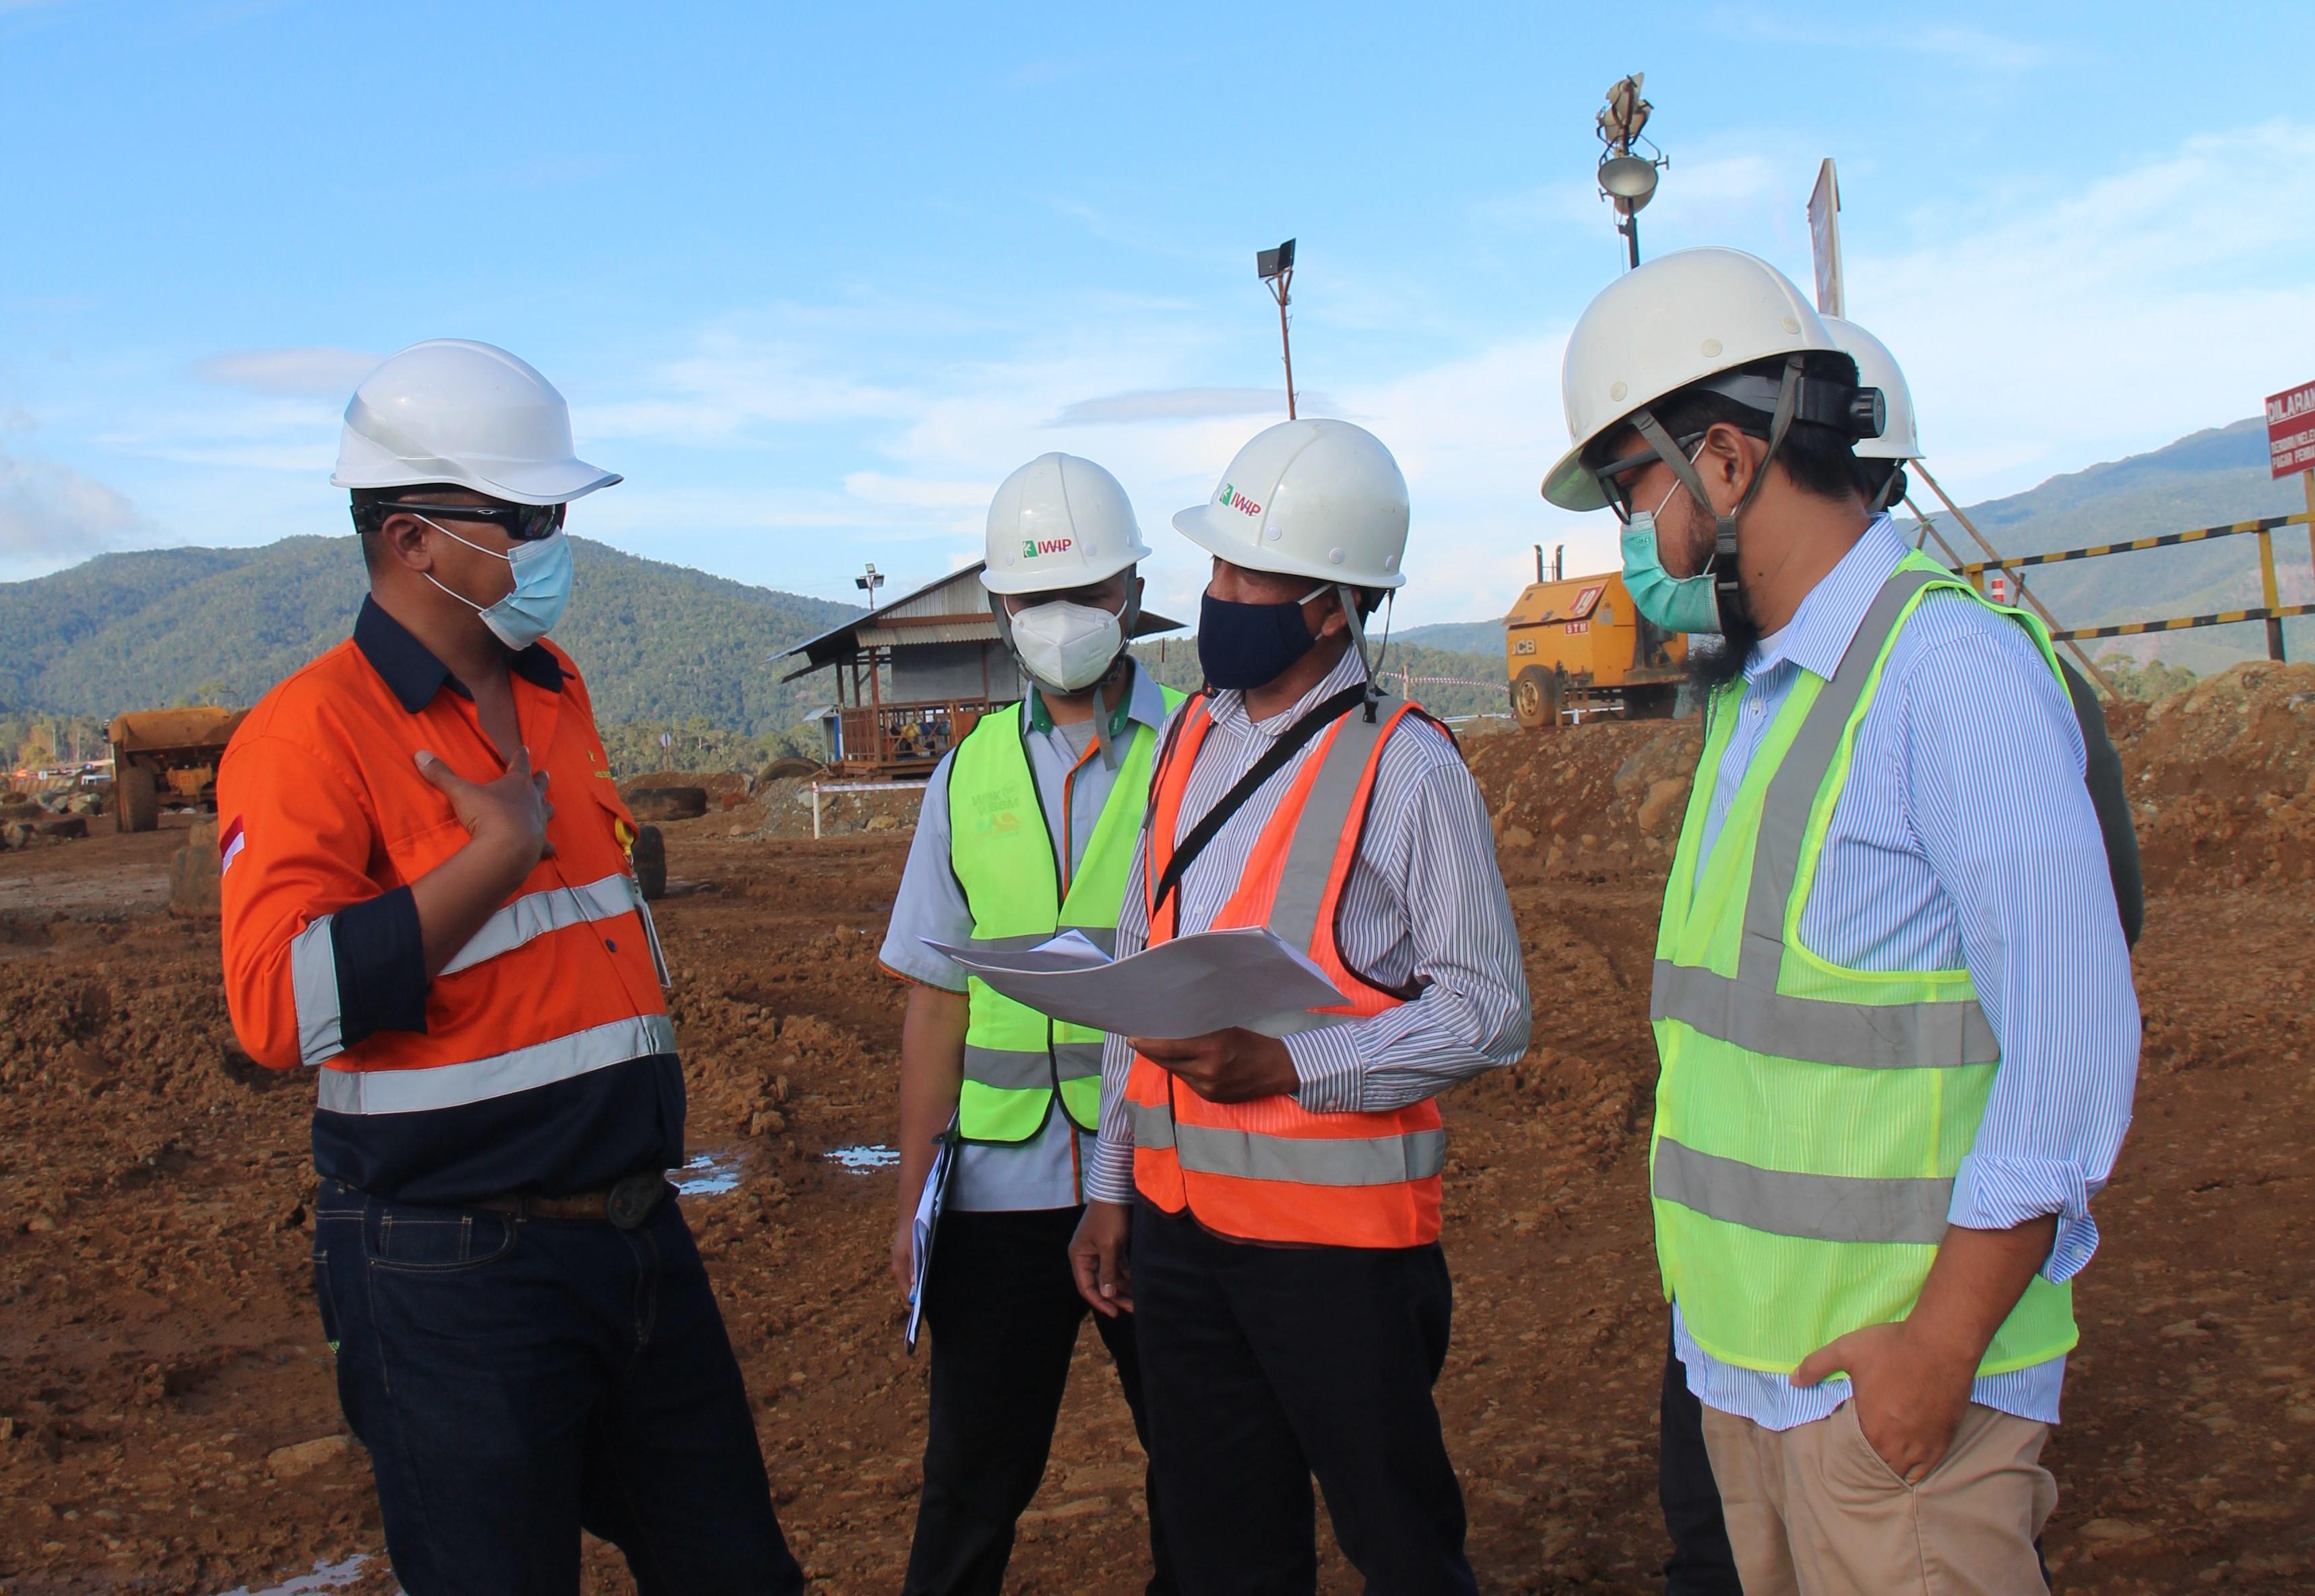 Pilot Project Penilaian SDA, KPKNL Ternate Telusuri Pertambangan Nikel di Bumi Halmahera